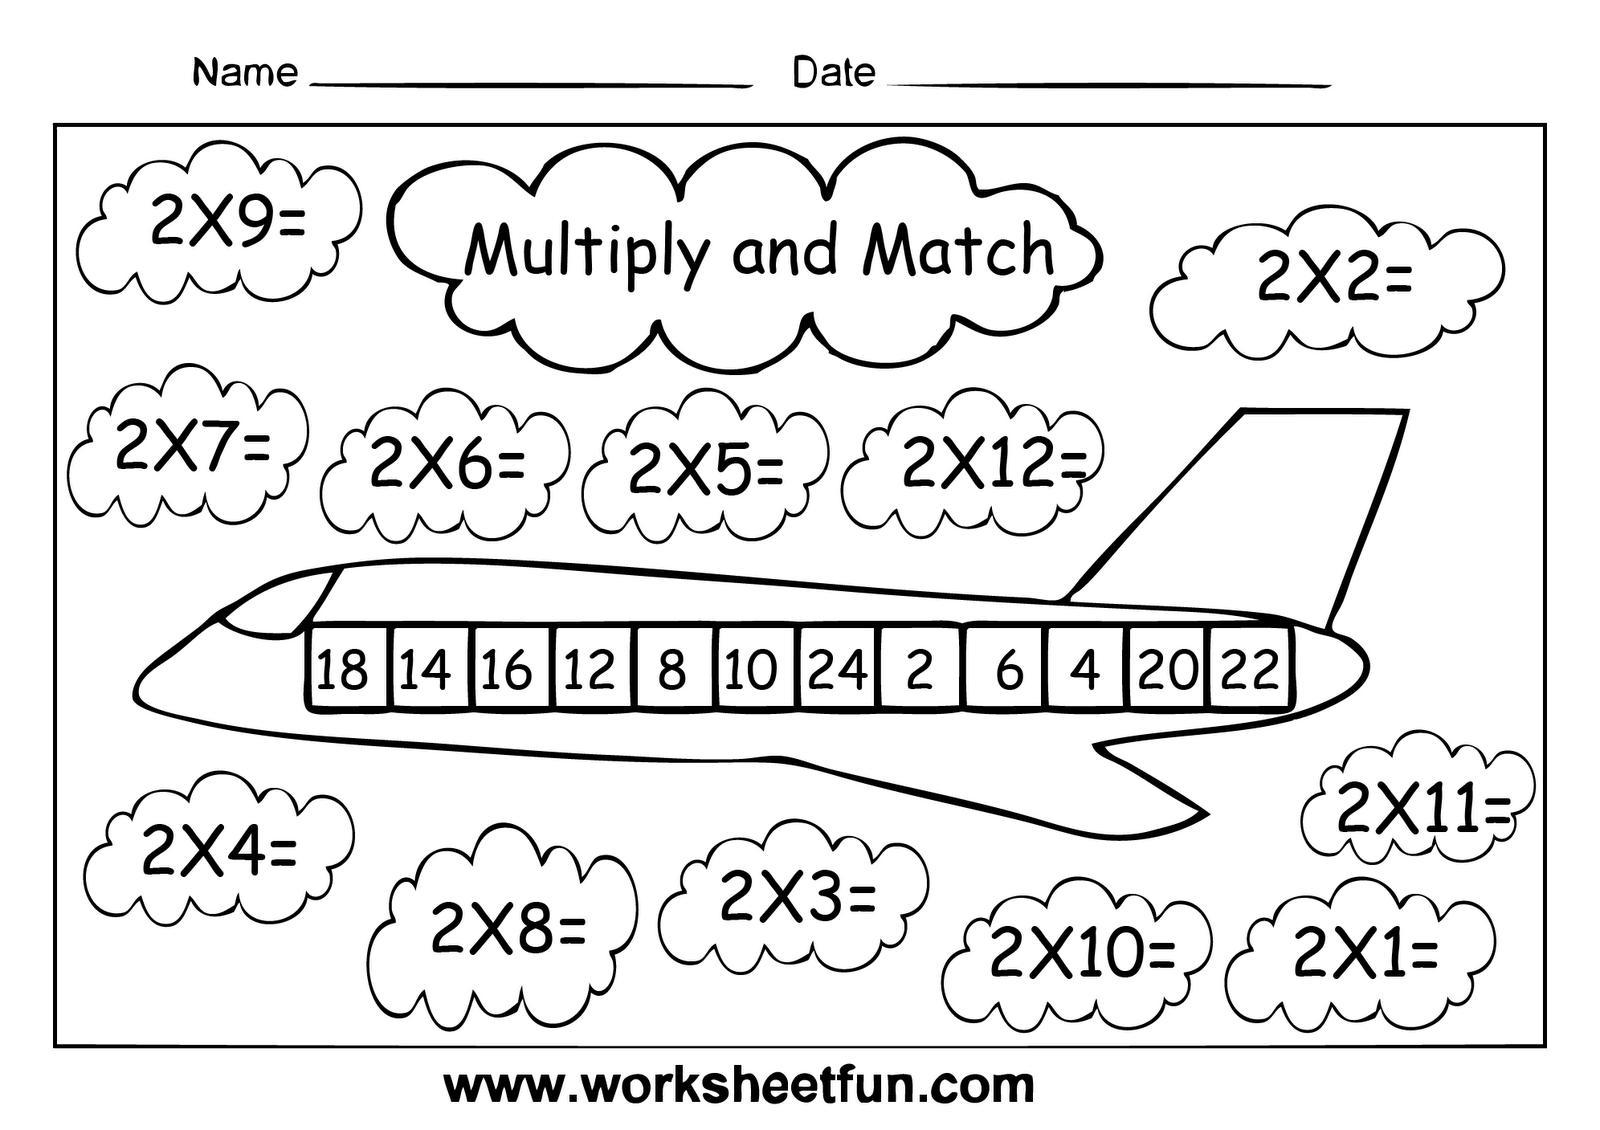 Multiplication Worksheets 5th Grade Pdf